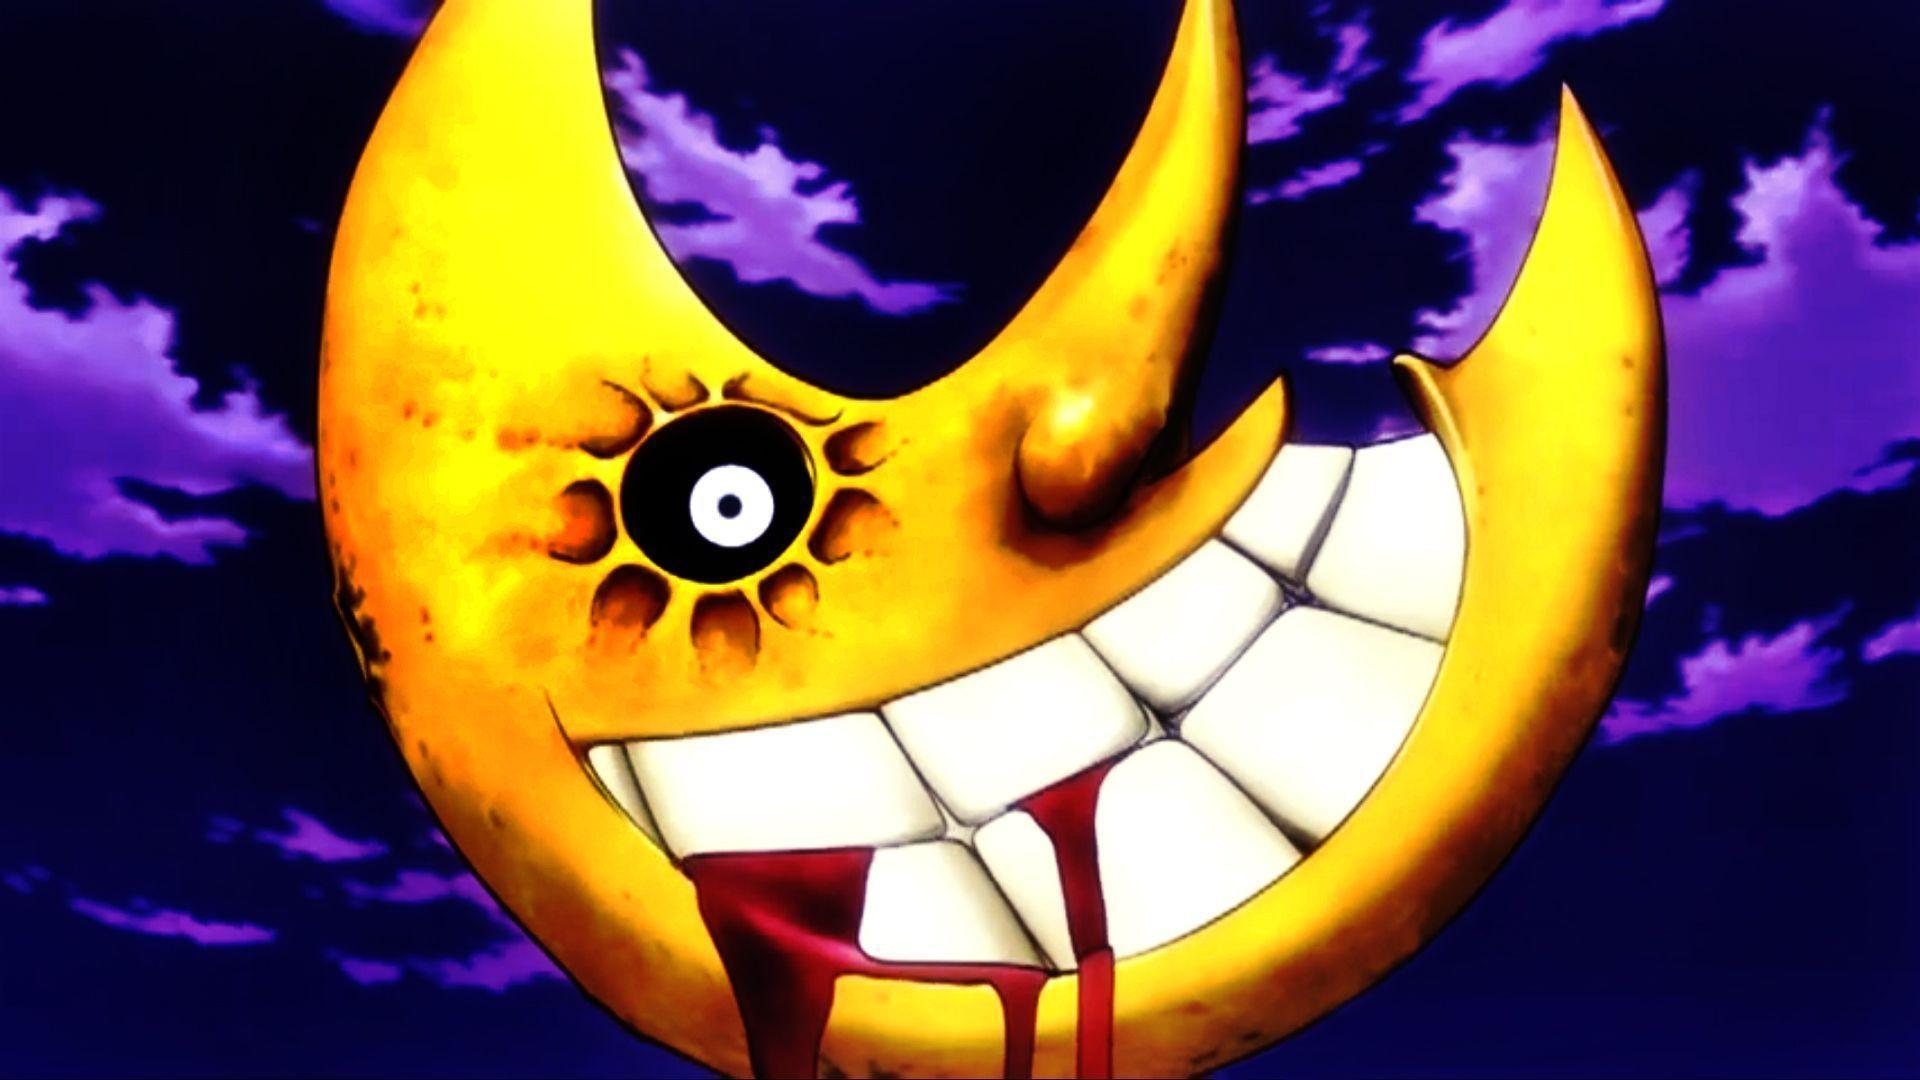 Soul Eater Moon wallpaper - 137739